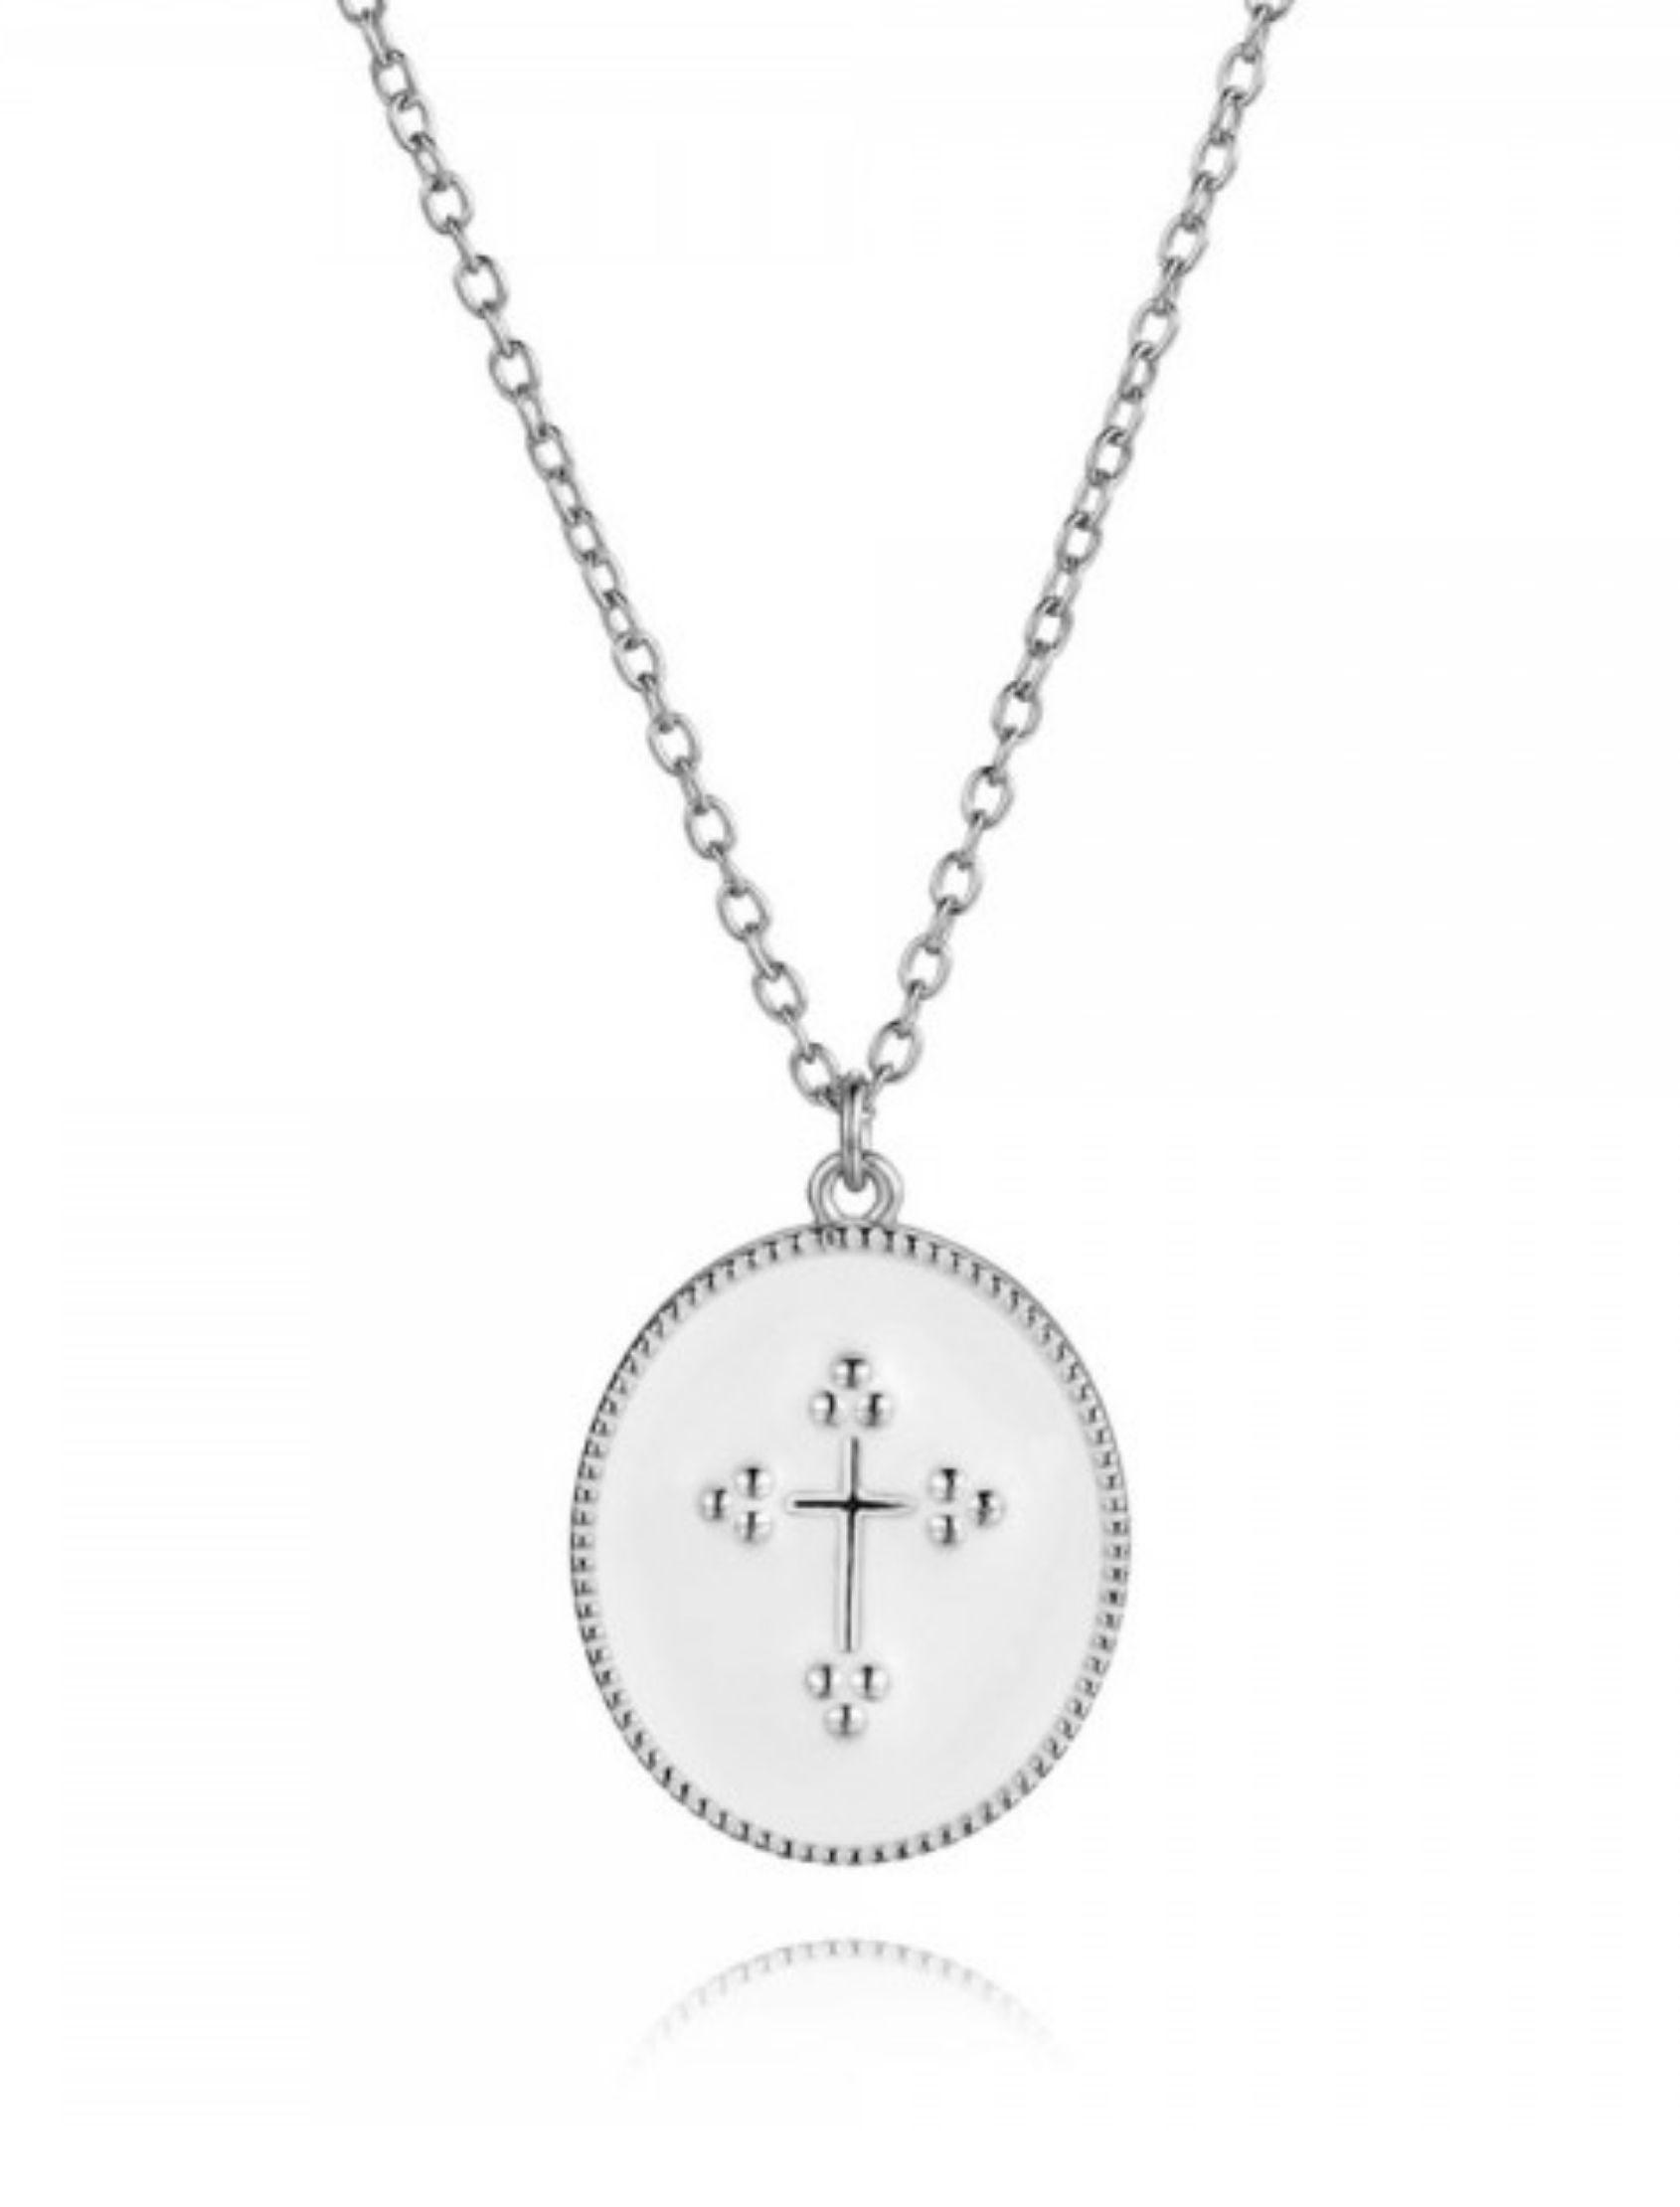 colgante de plata con medalla de cruz sobre base esmaltada blnca